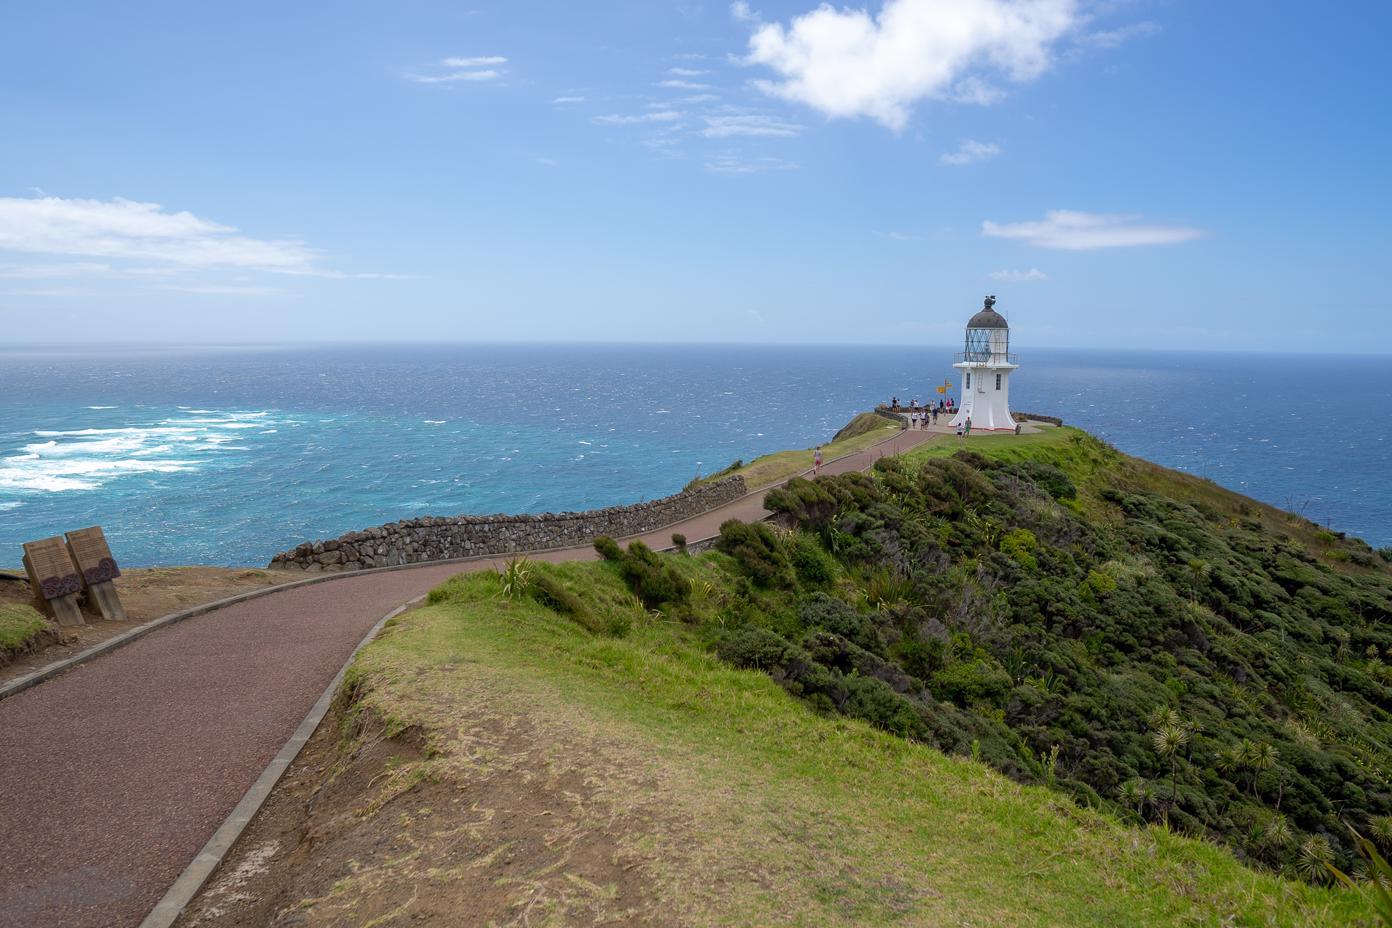 North Island New Zealand Highlights - Cape Reinga Lighthouse